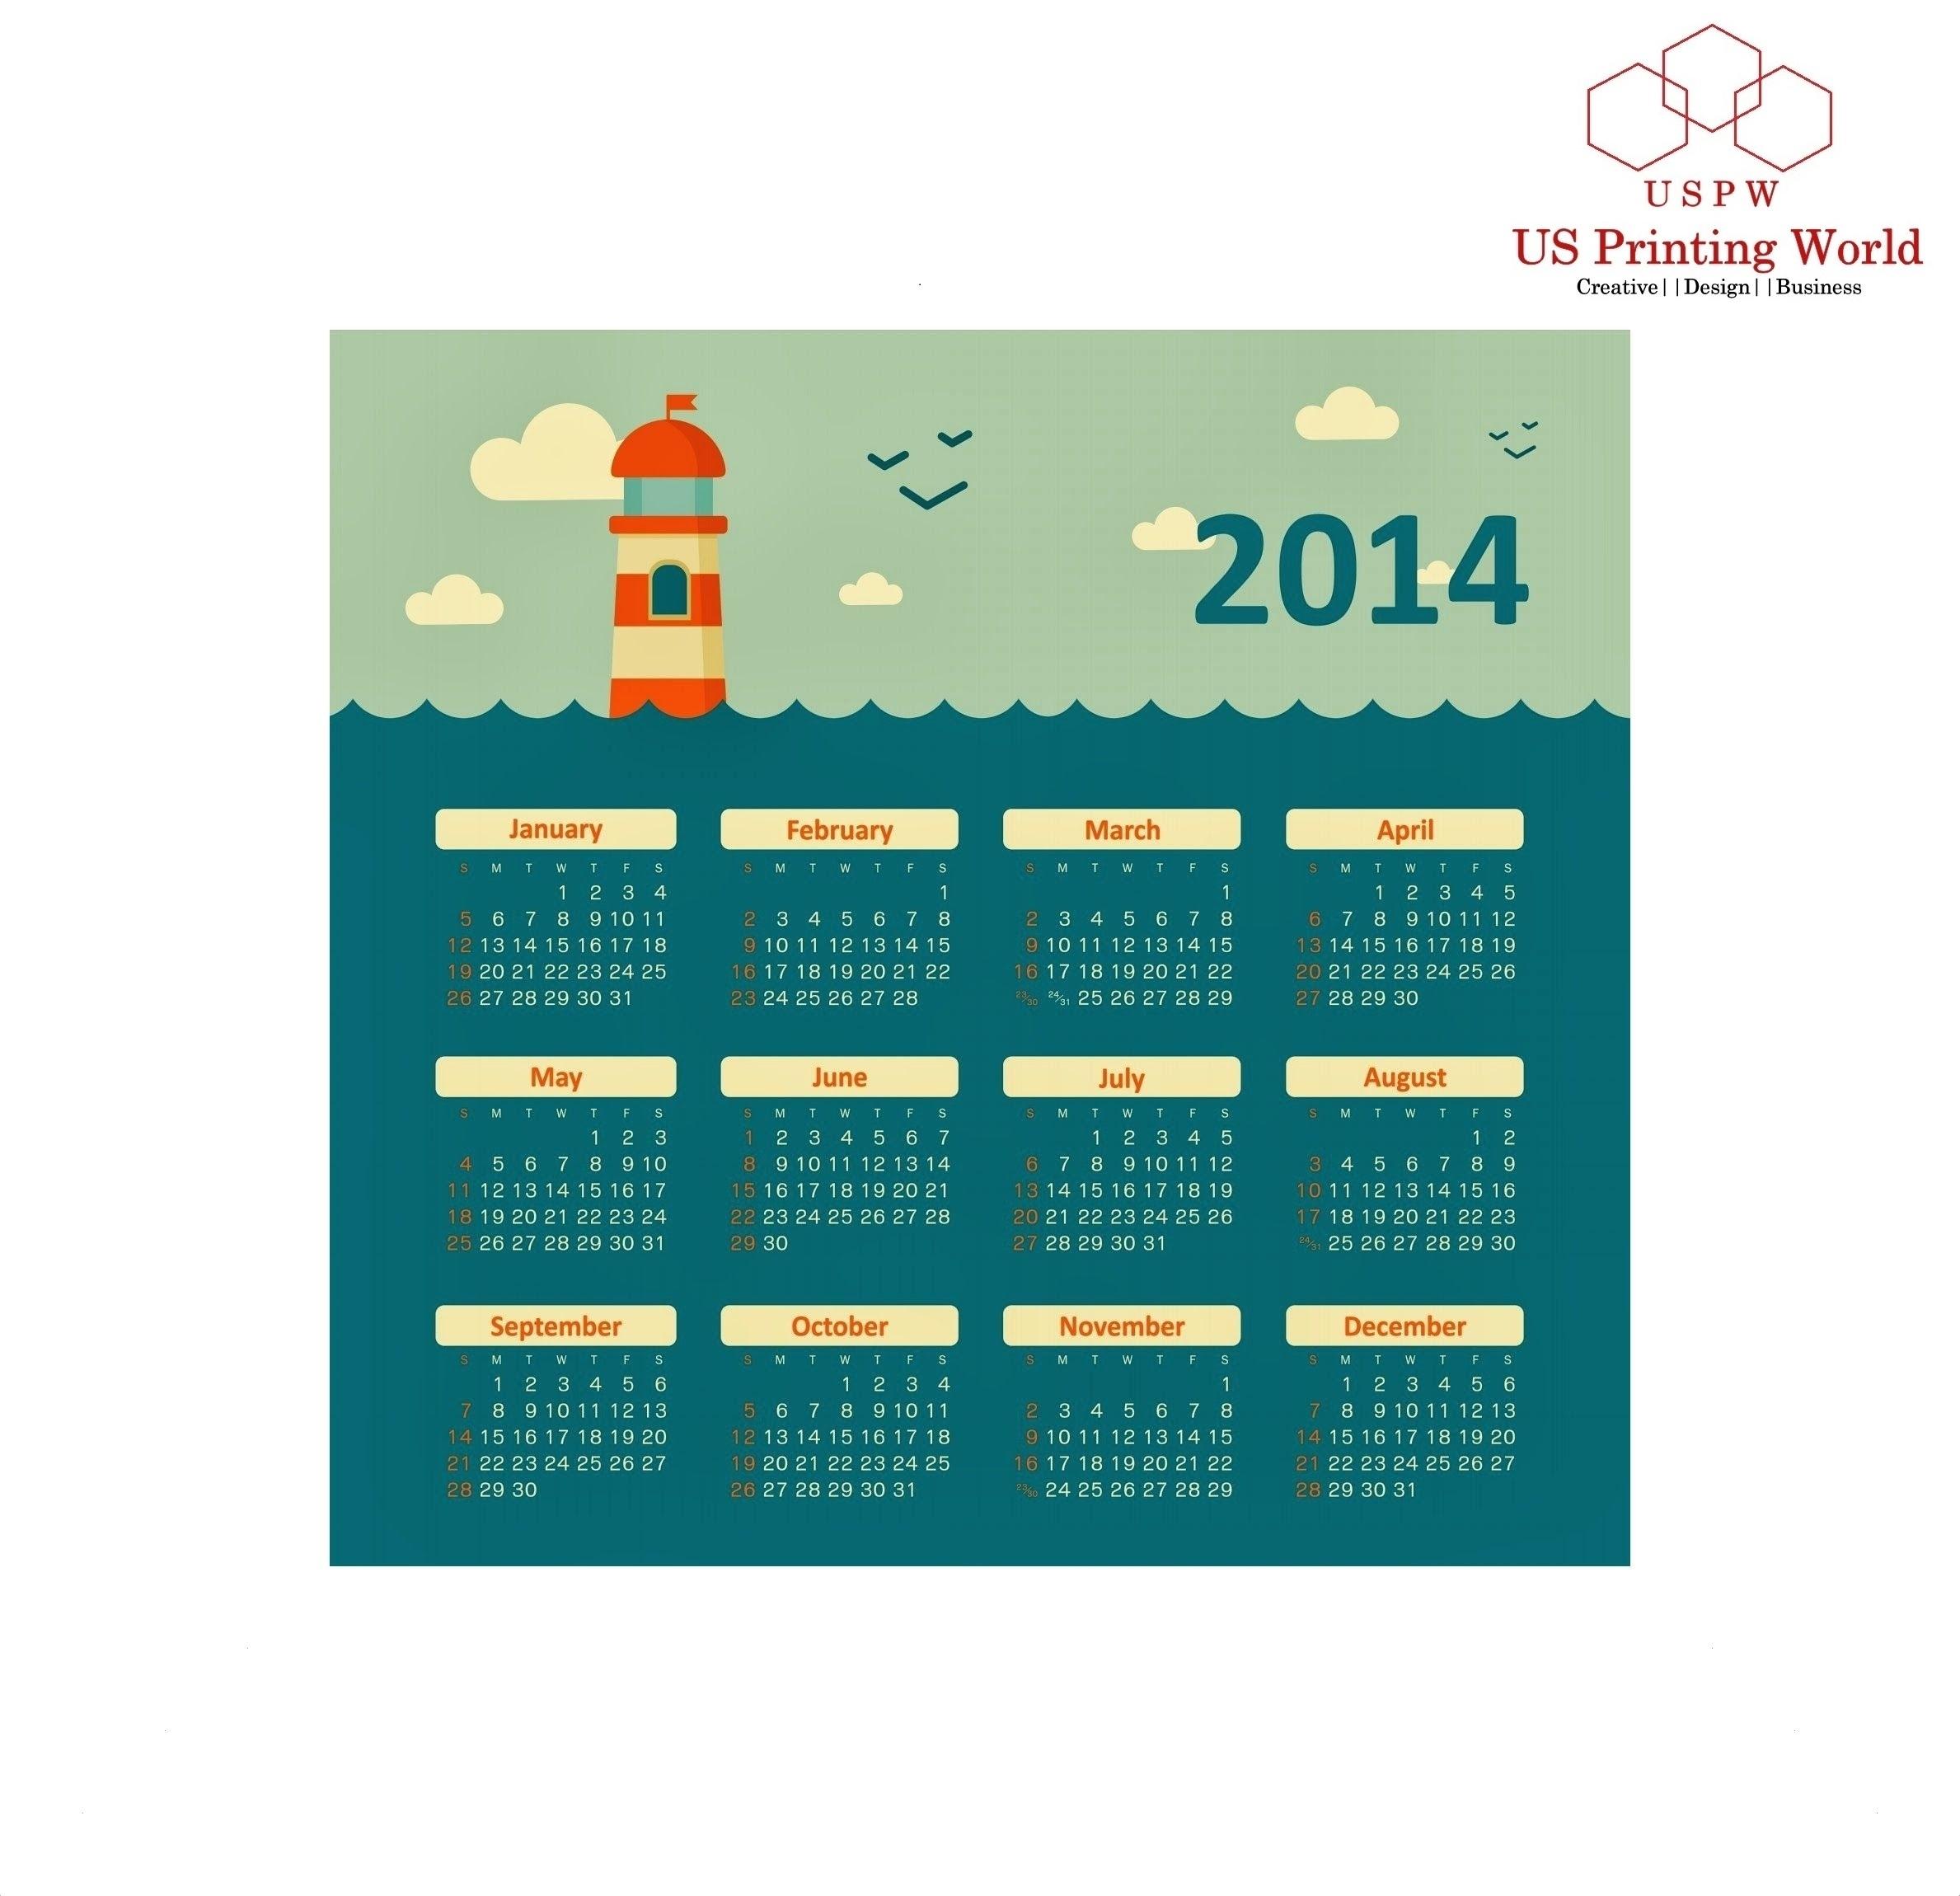 Calendar Printing In Dhaka • Printable Blank Calendar Template_Calendar Printing In Dhaka